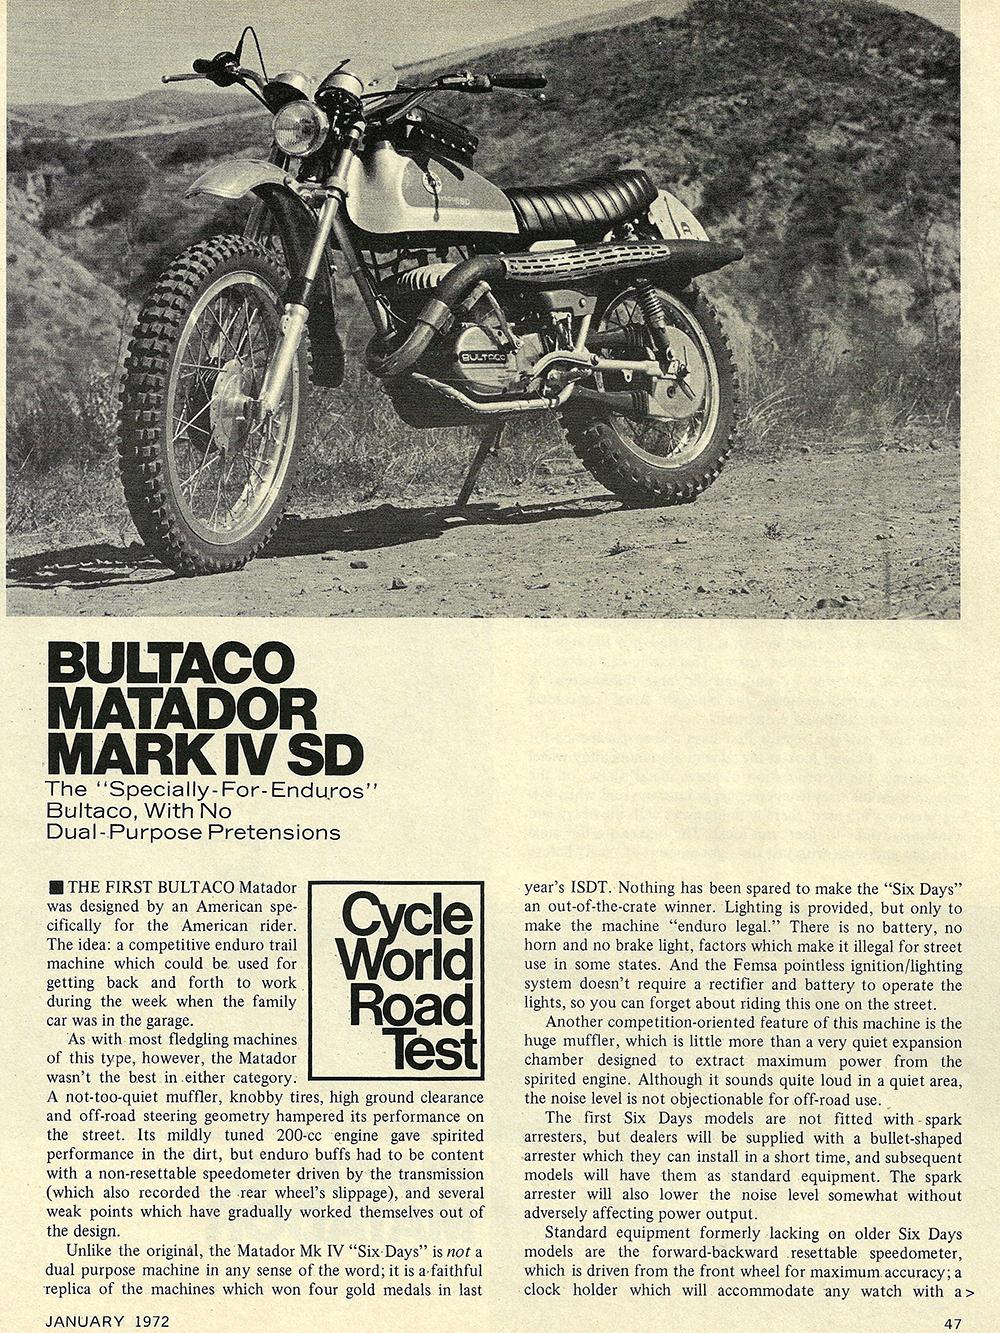 1972 Bultaco Matador Mark 4 SD road test 02.jpg